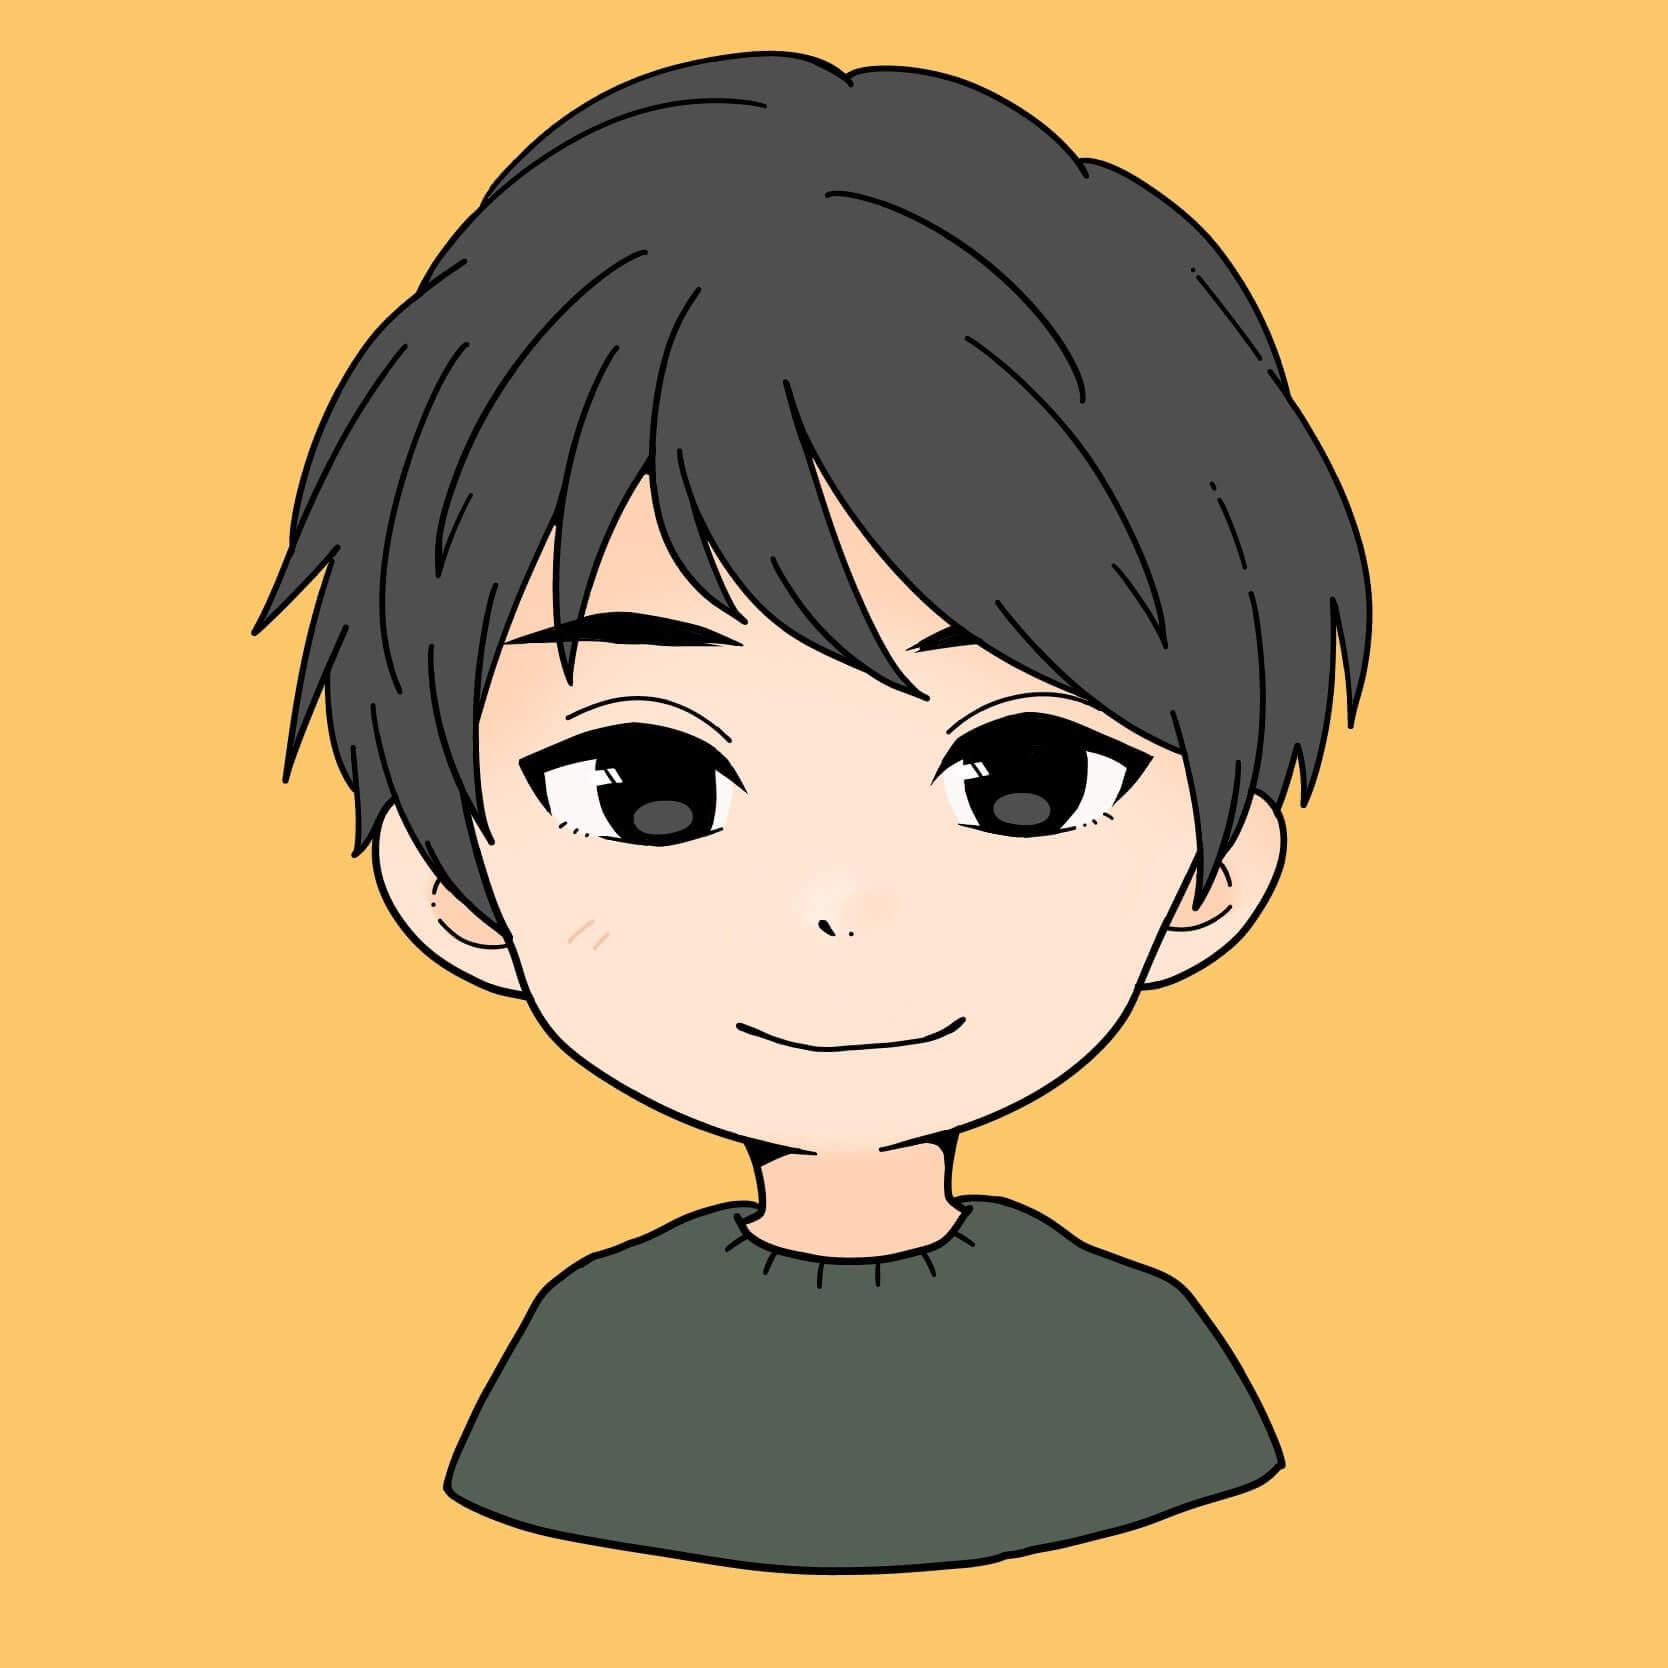 https://www.kumao-blog.com/wp-content/uploads/2020/08/eeacc5d669b3220f06e7aa43eaaa53e3.jpg